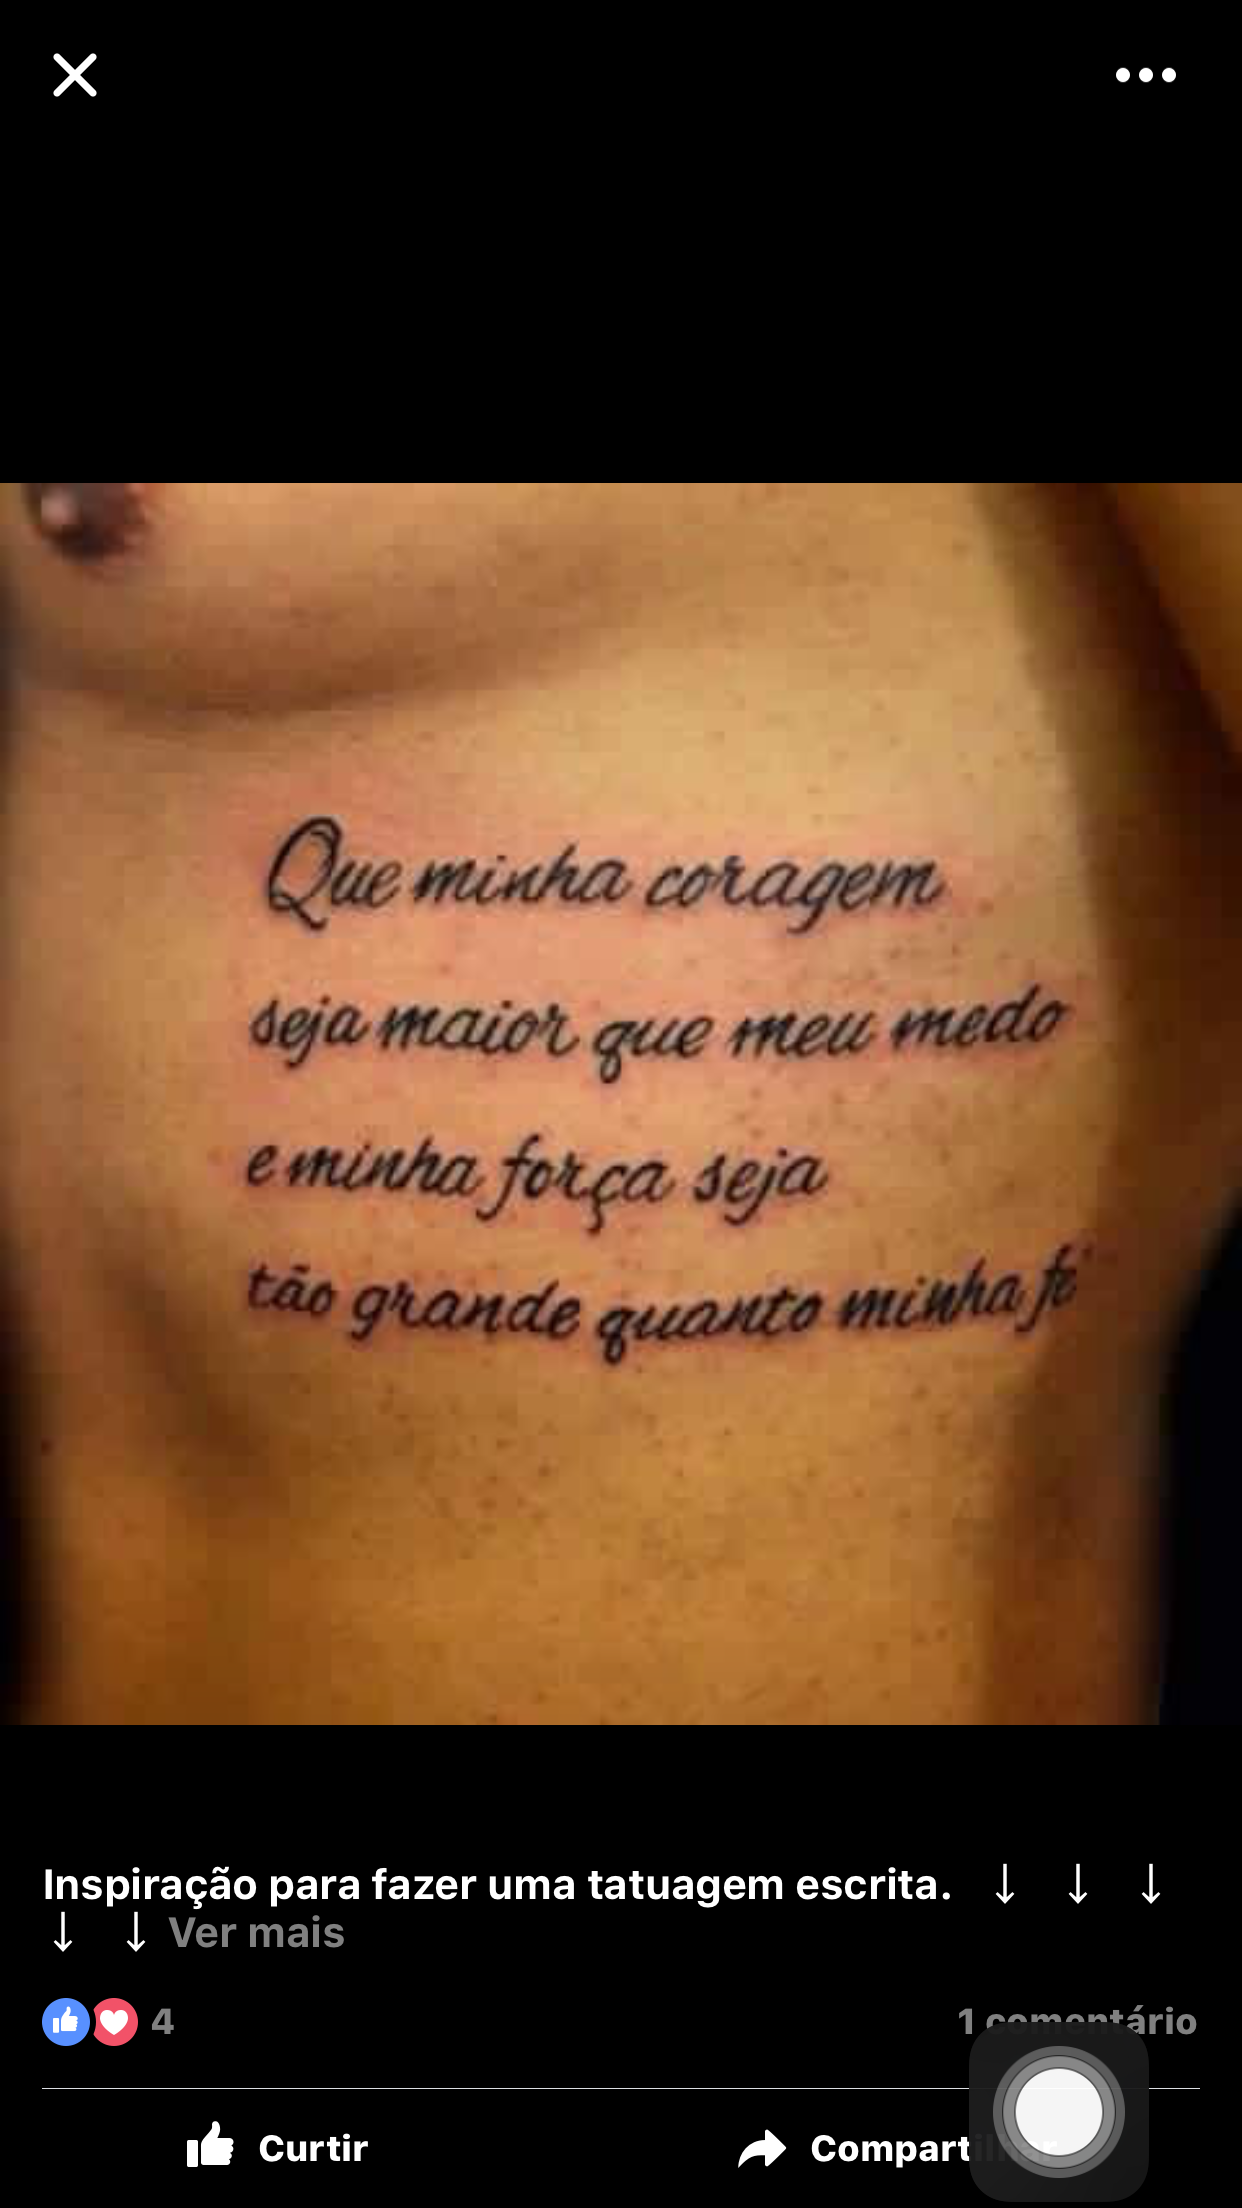 Tattoo costela tatto costela pinterest tattoo costela costela tattoo costela altavistaventures Image collections